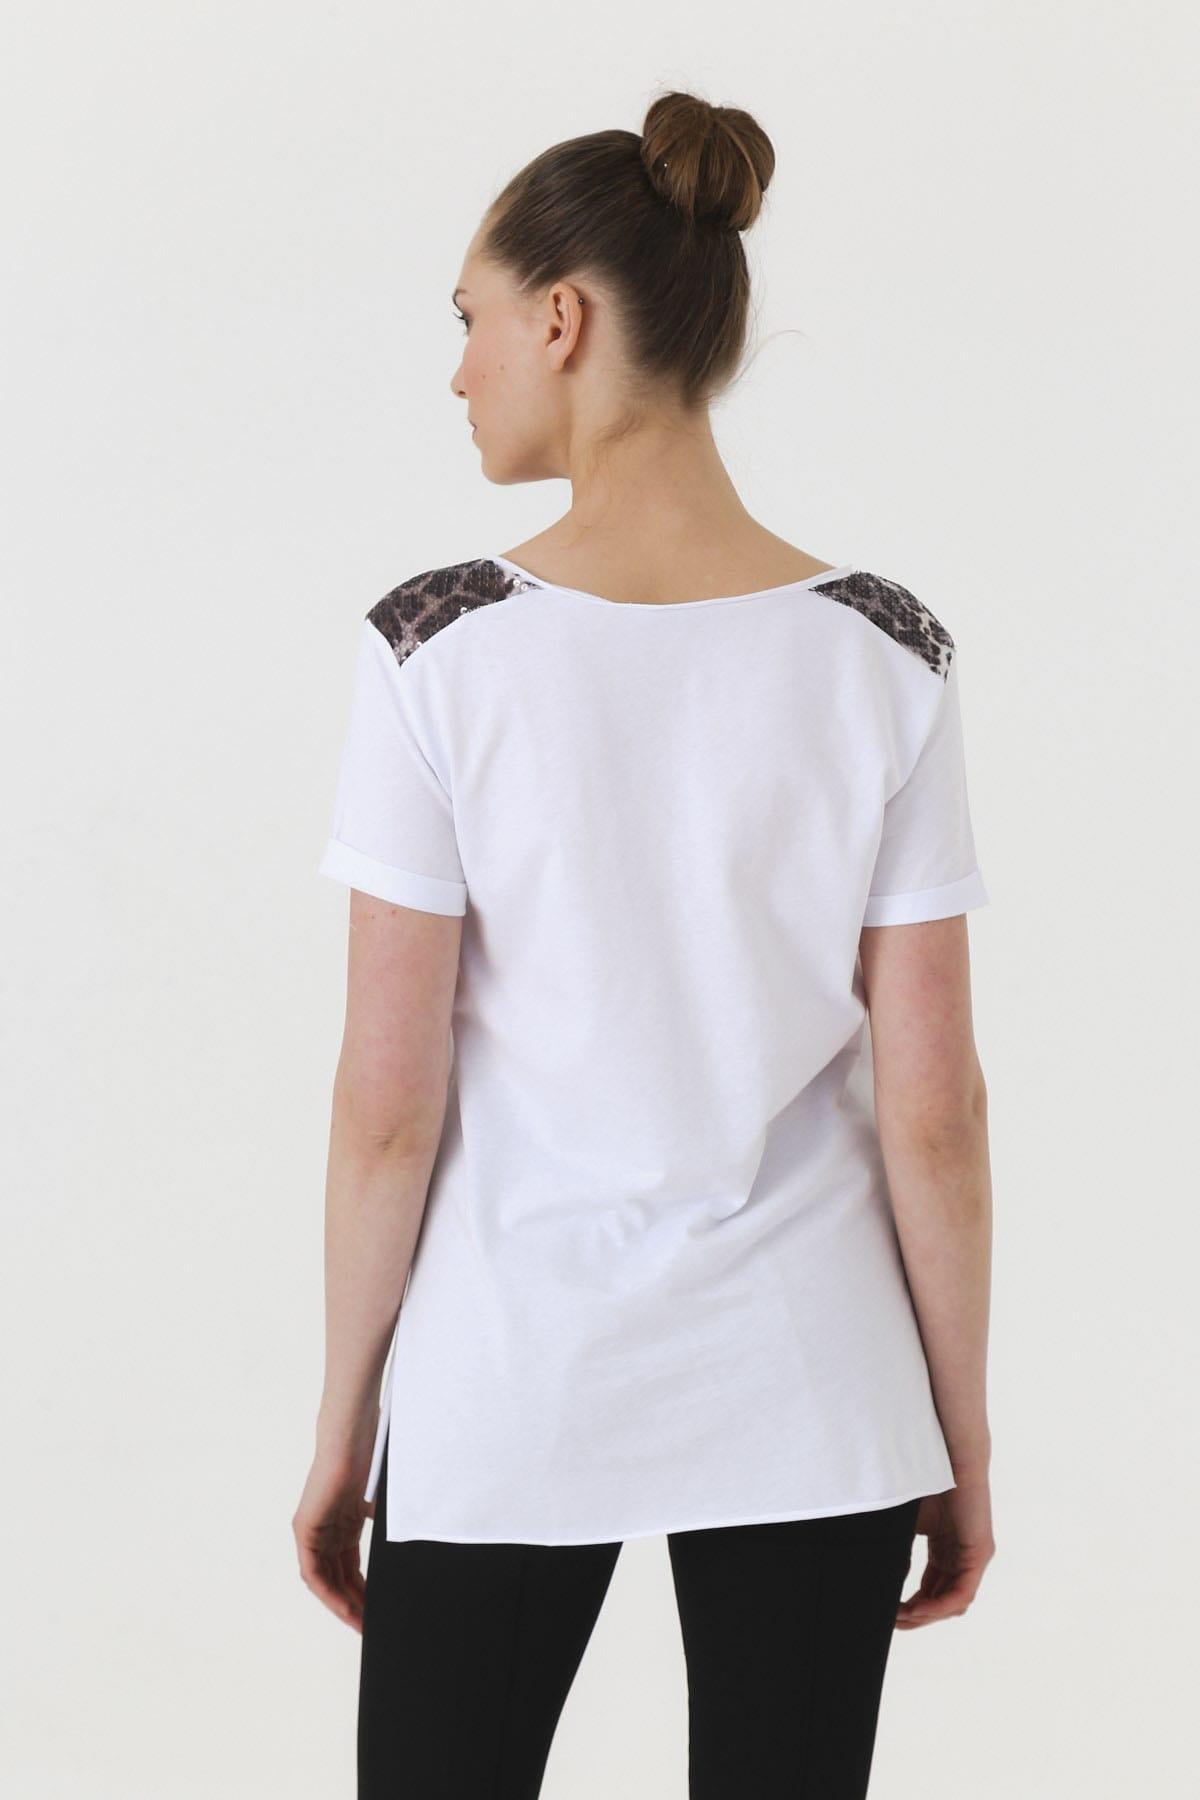 Jument Kadın Beyaz T-shirt 7090 2